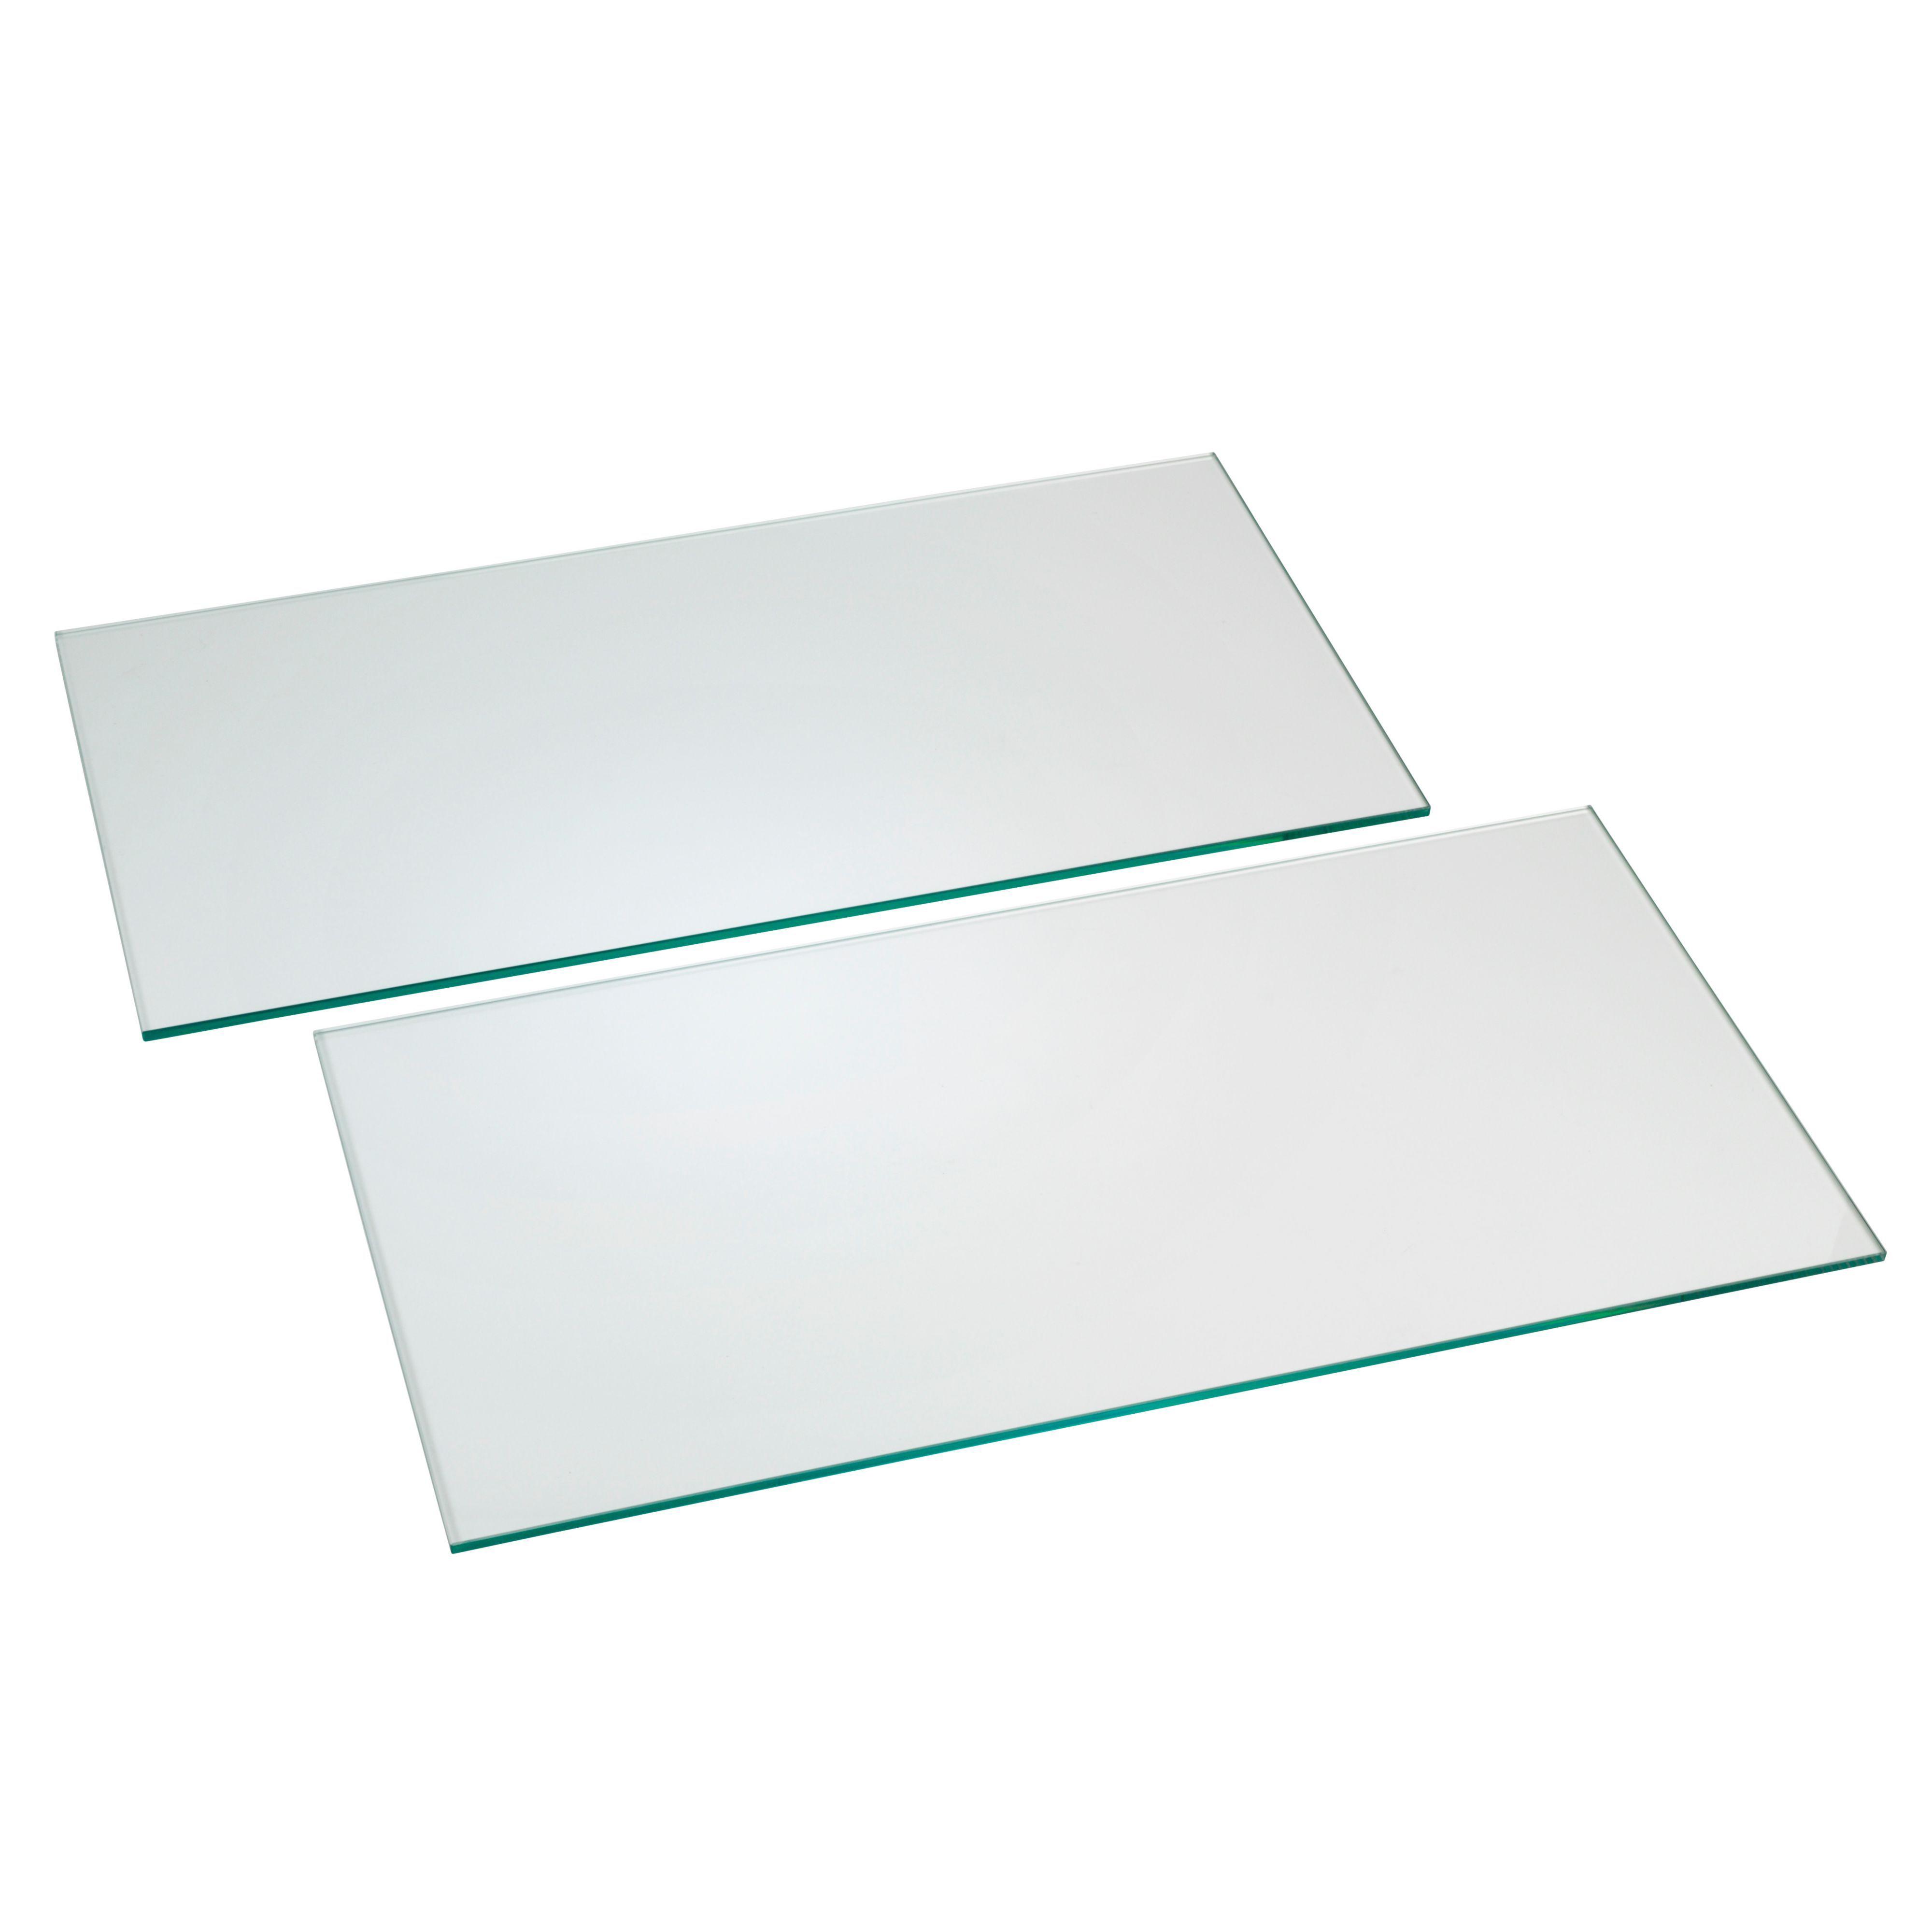 Clear Glass Cupboard Shelf (l)458mm (d)280mm